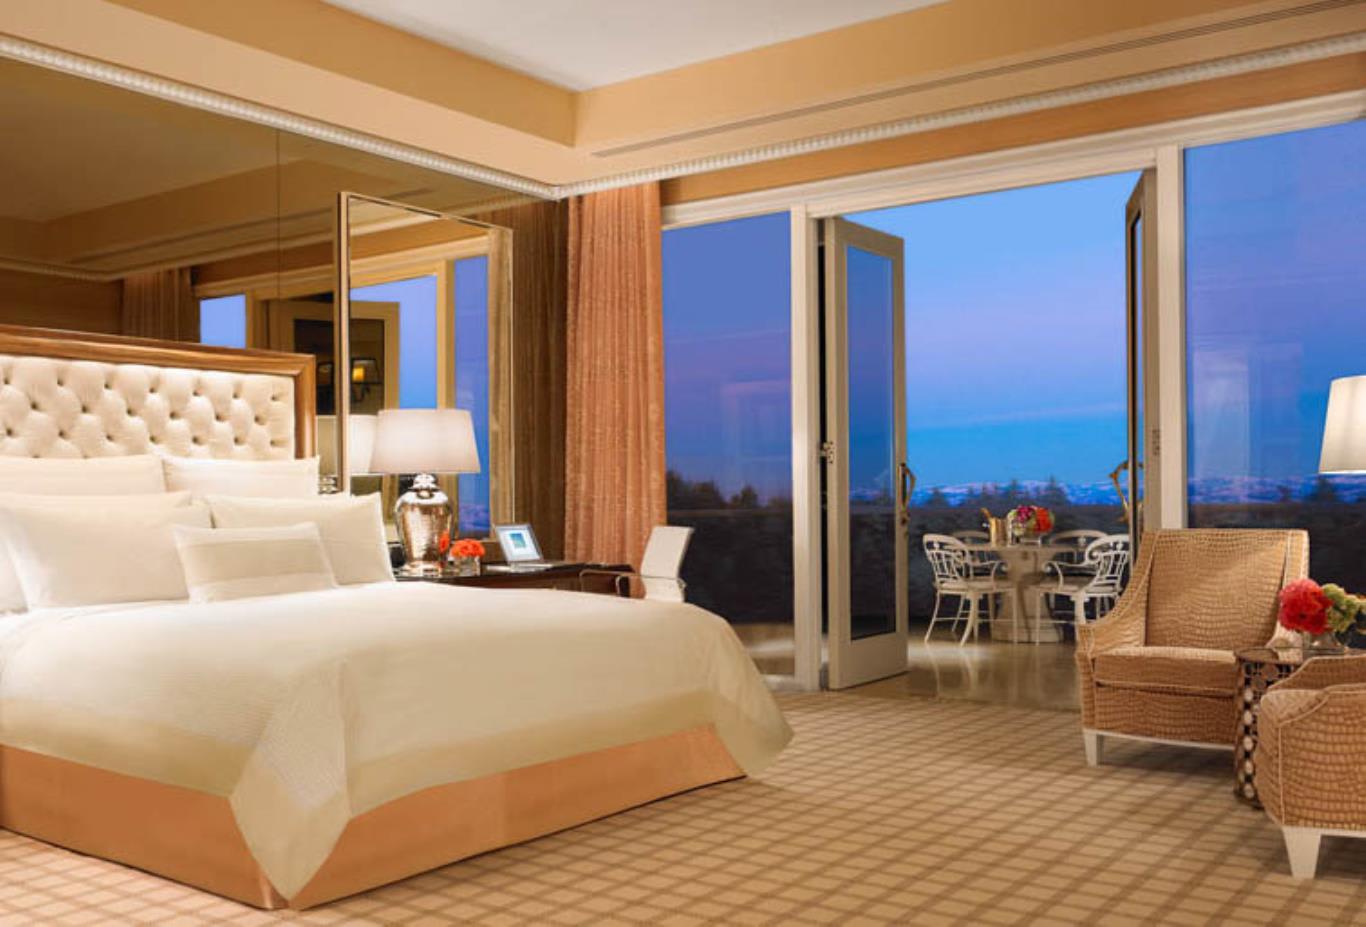 Wynn Las Vegas | Las Vegas | Destinology